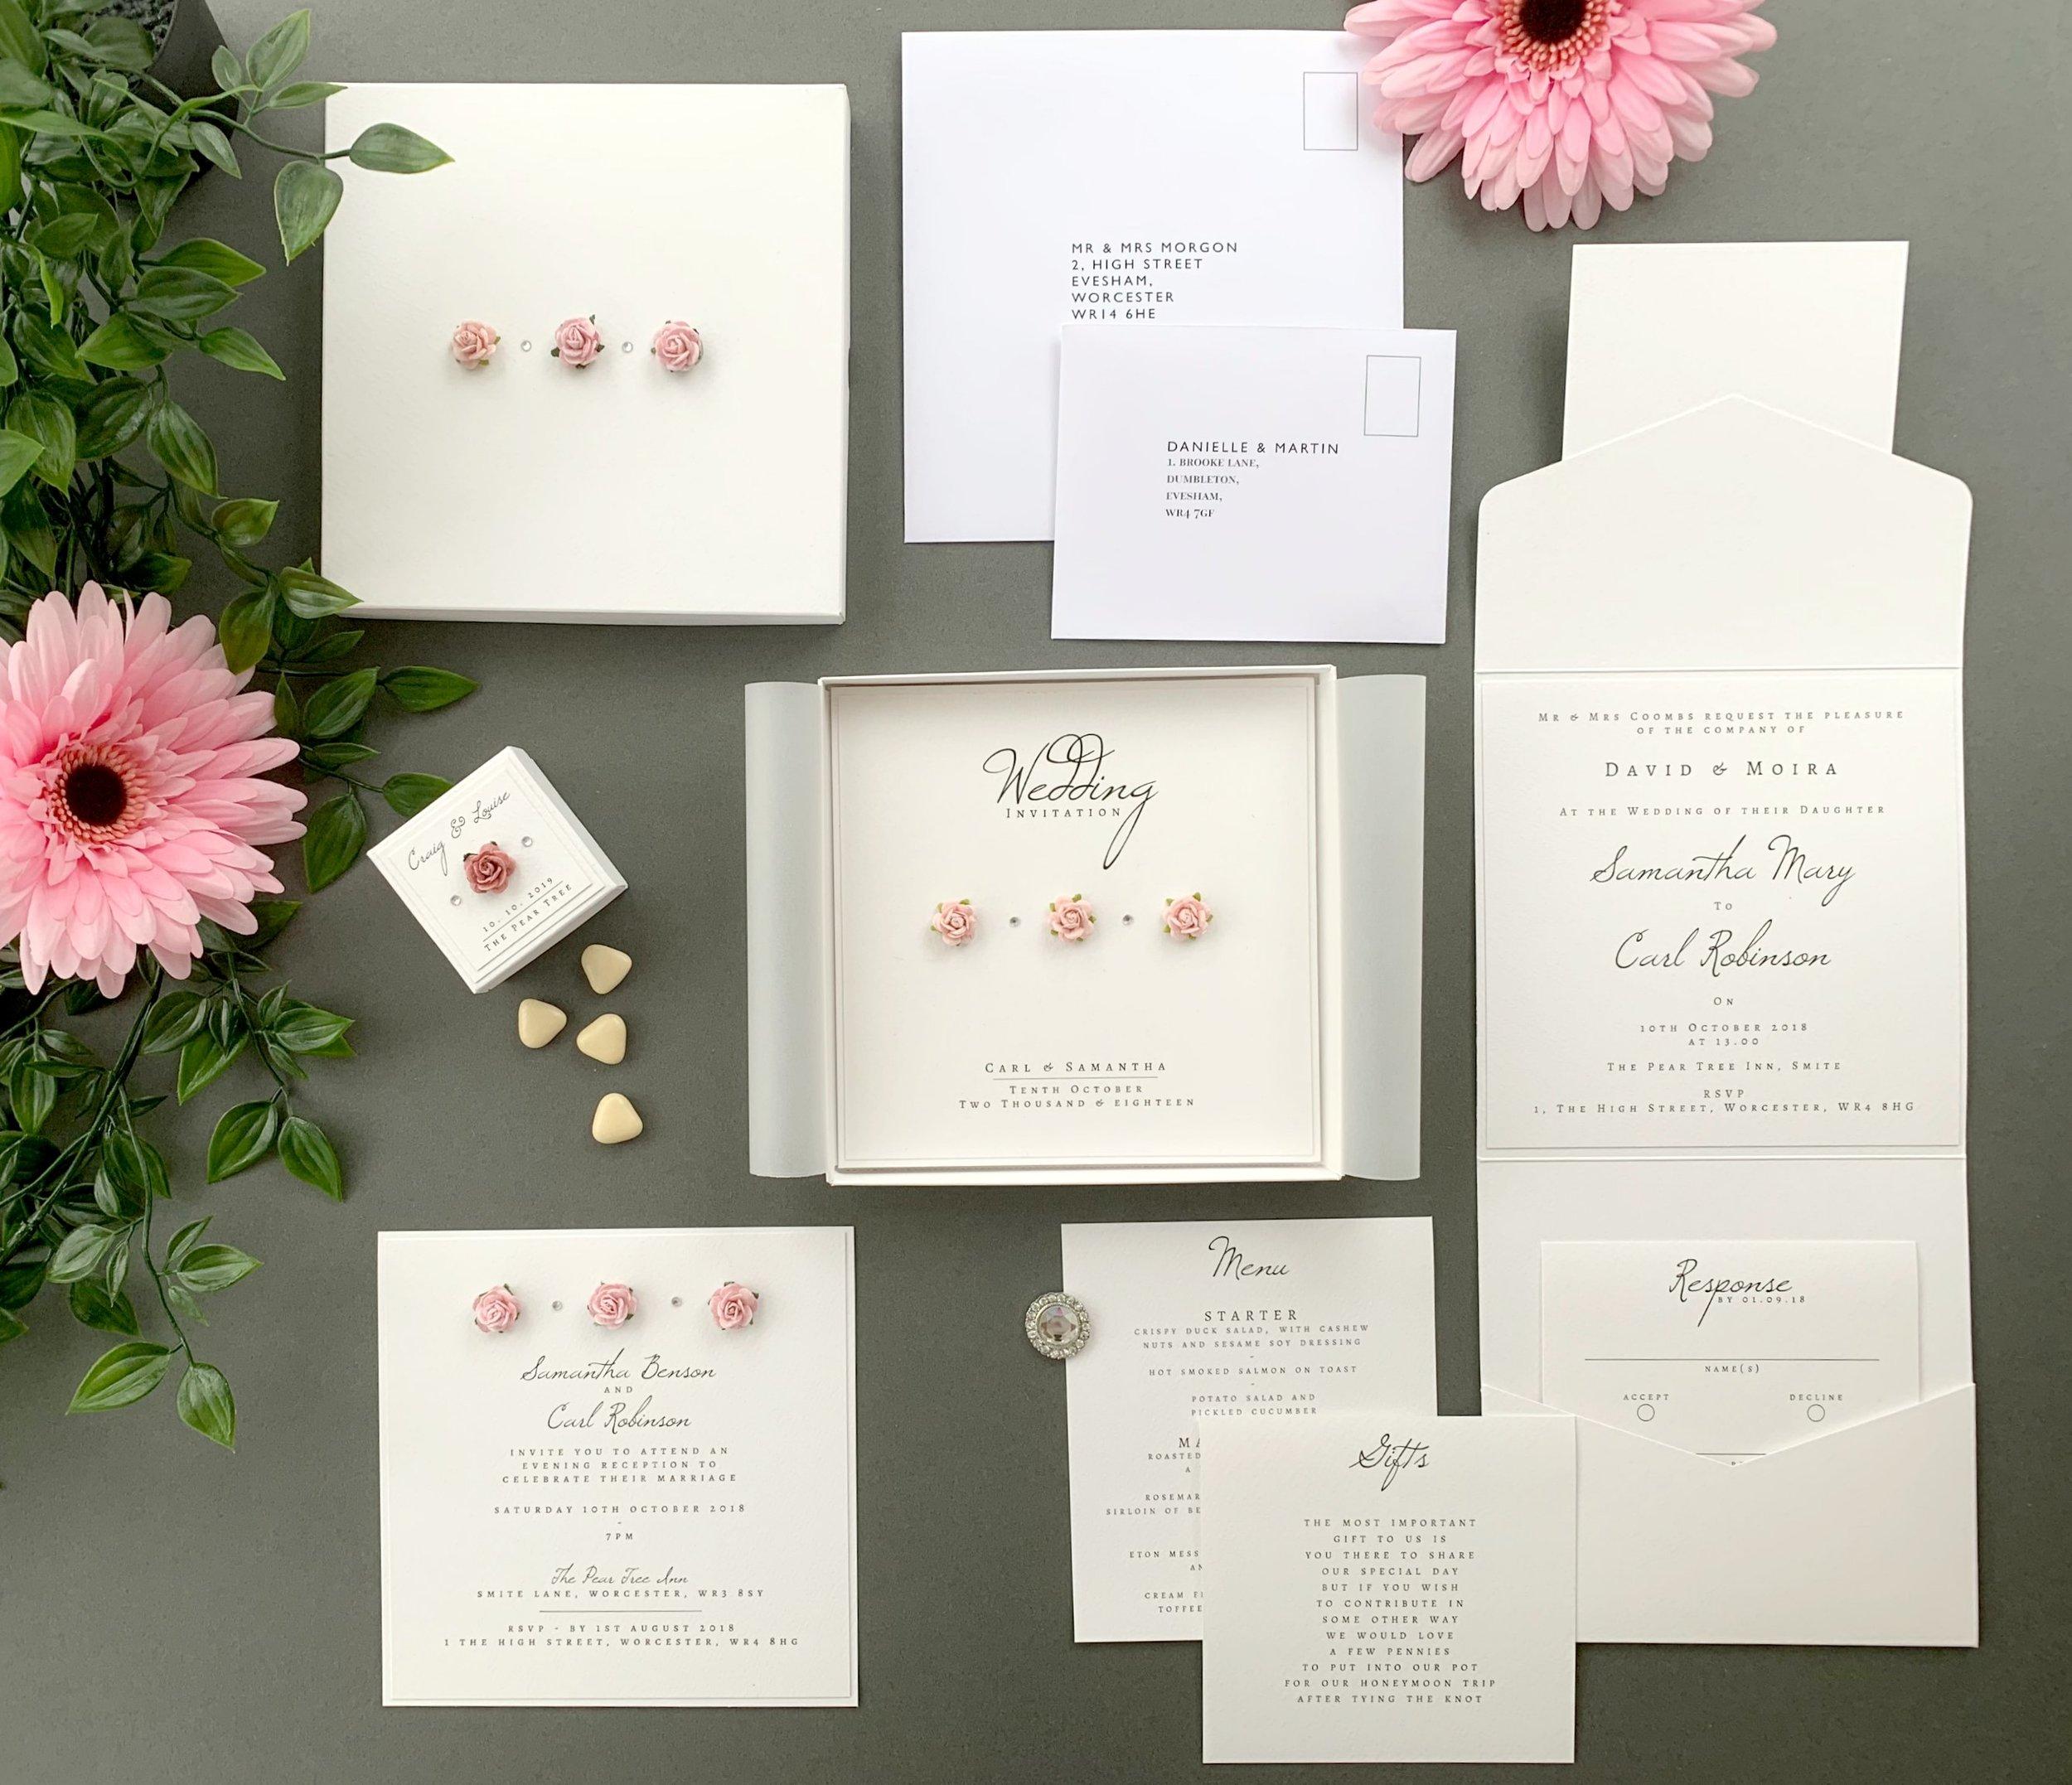 Eos - Invitation Collection.jpg